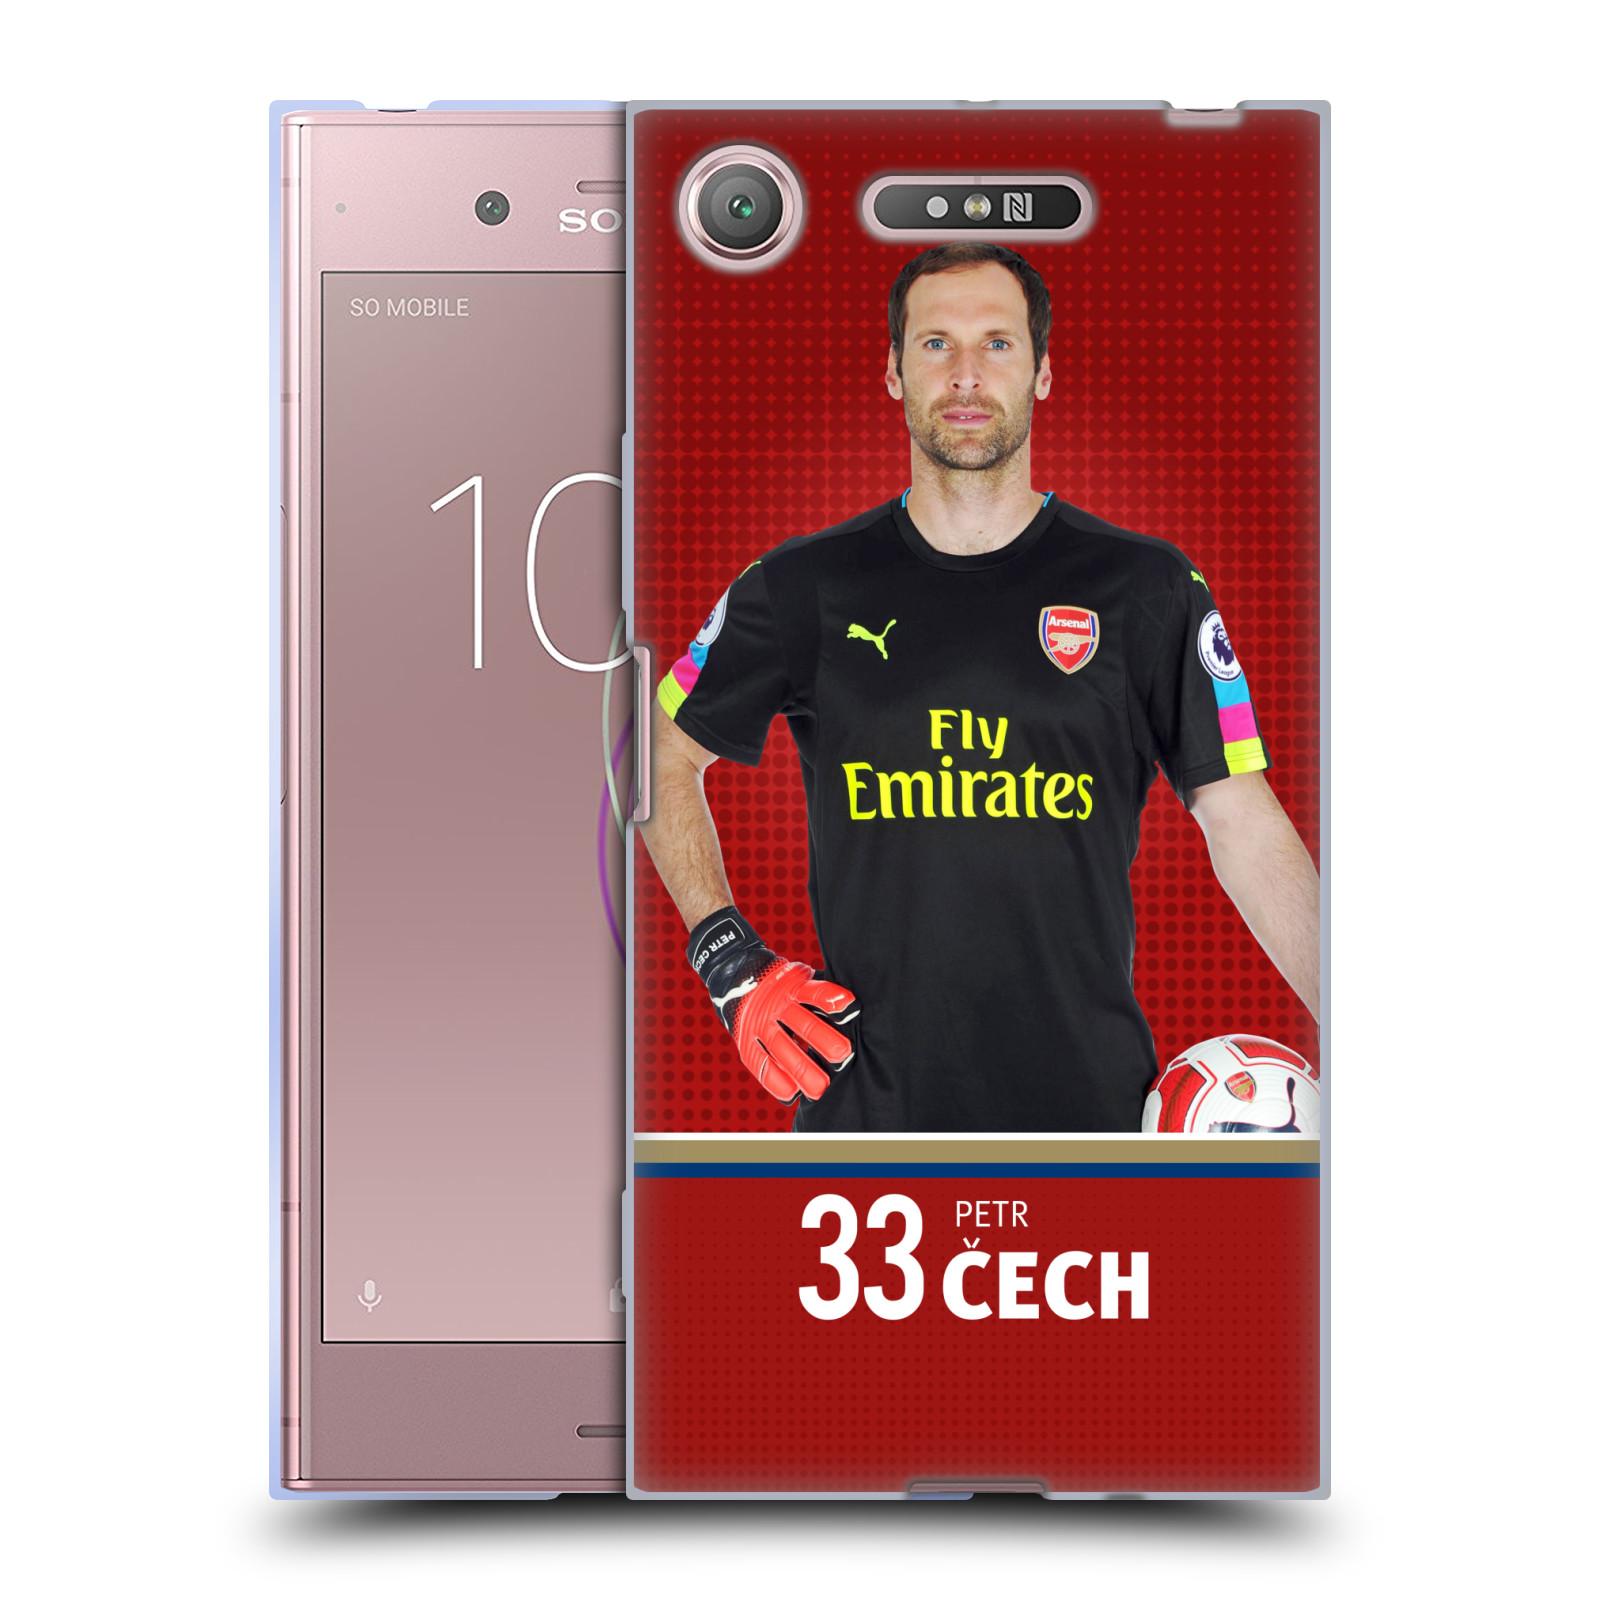 Silikonové pouzdro na mobil Sony Xperia XZ1 - Head Case - Arsenal FC - Petr Čech